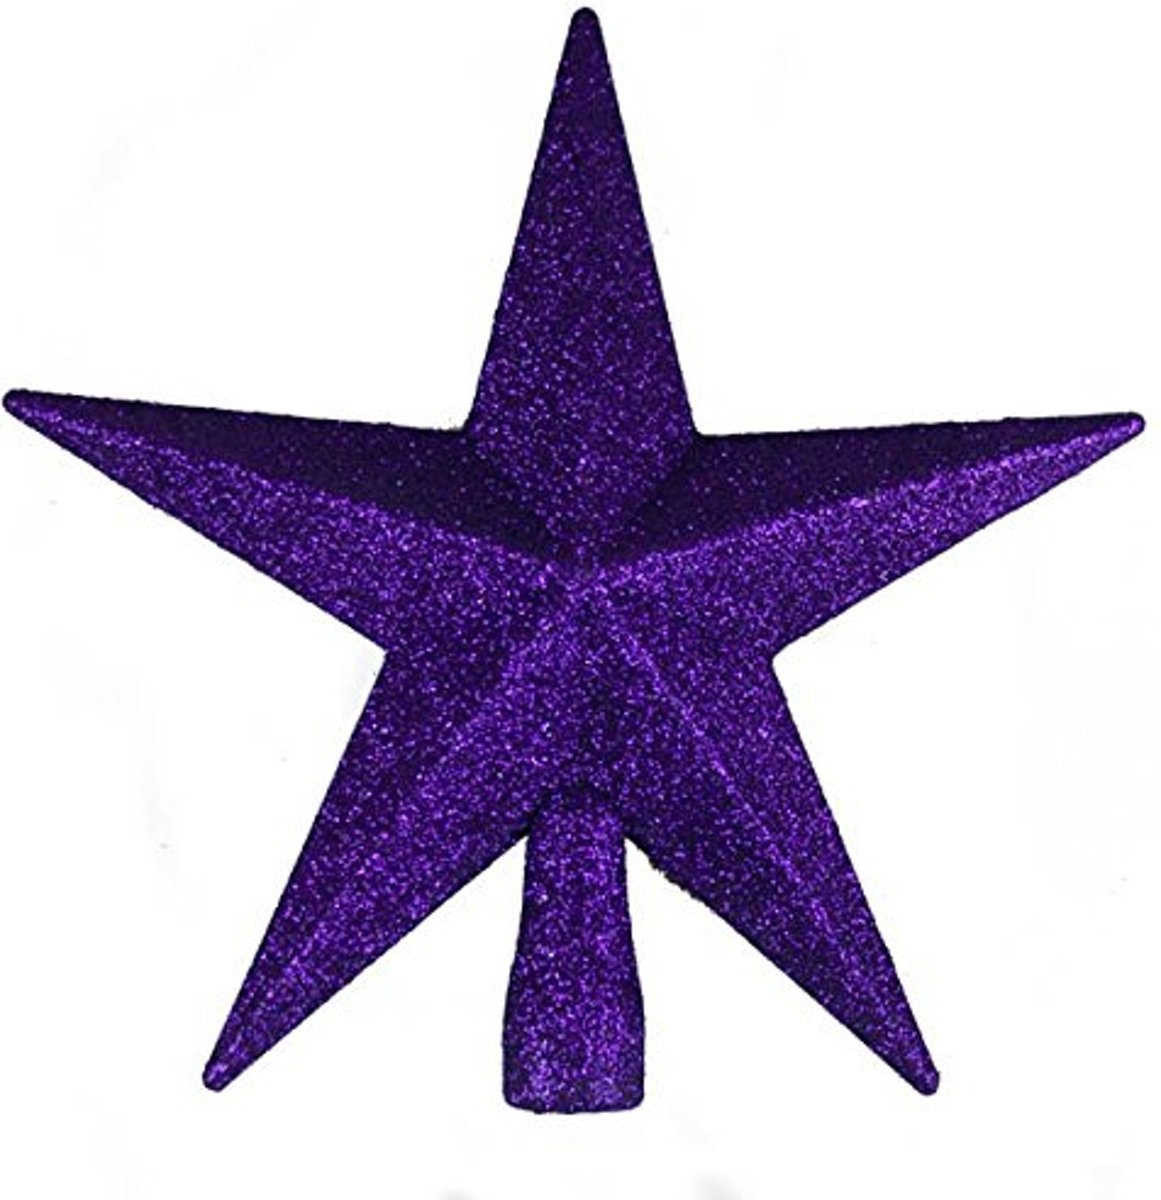 Kerstversiering   Paarse glitter ster als piek   Purper Glitter Finish Tree Top Star -20cm kopen